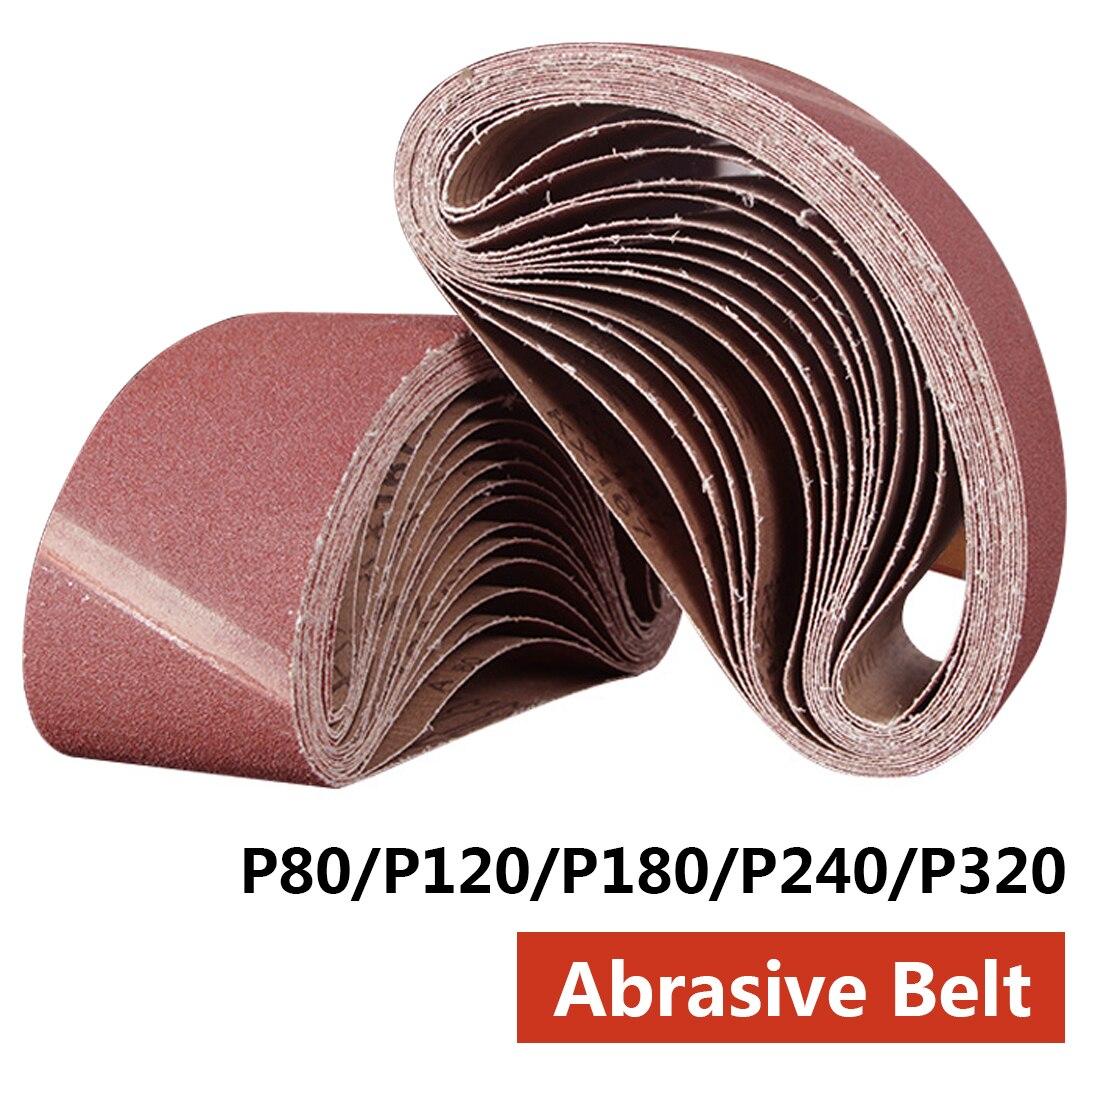 Herramienta abrasiva 533x75mm bandas de lijado 80-320 bandas de papel lija abrasivo para lijadora herramientas eléctricas giratorias accesorios dremel